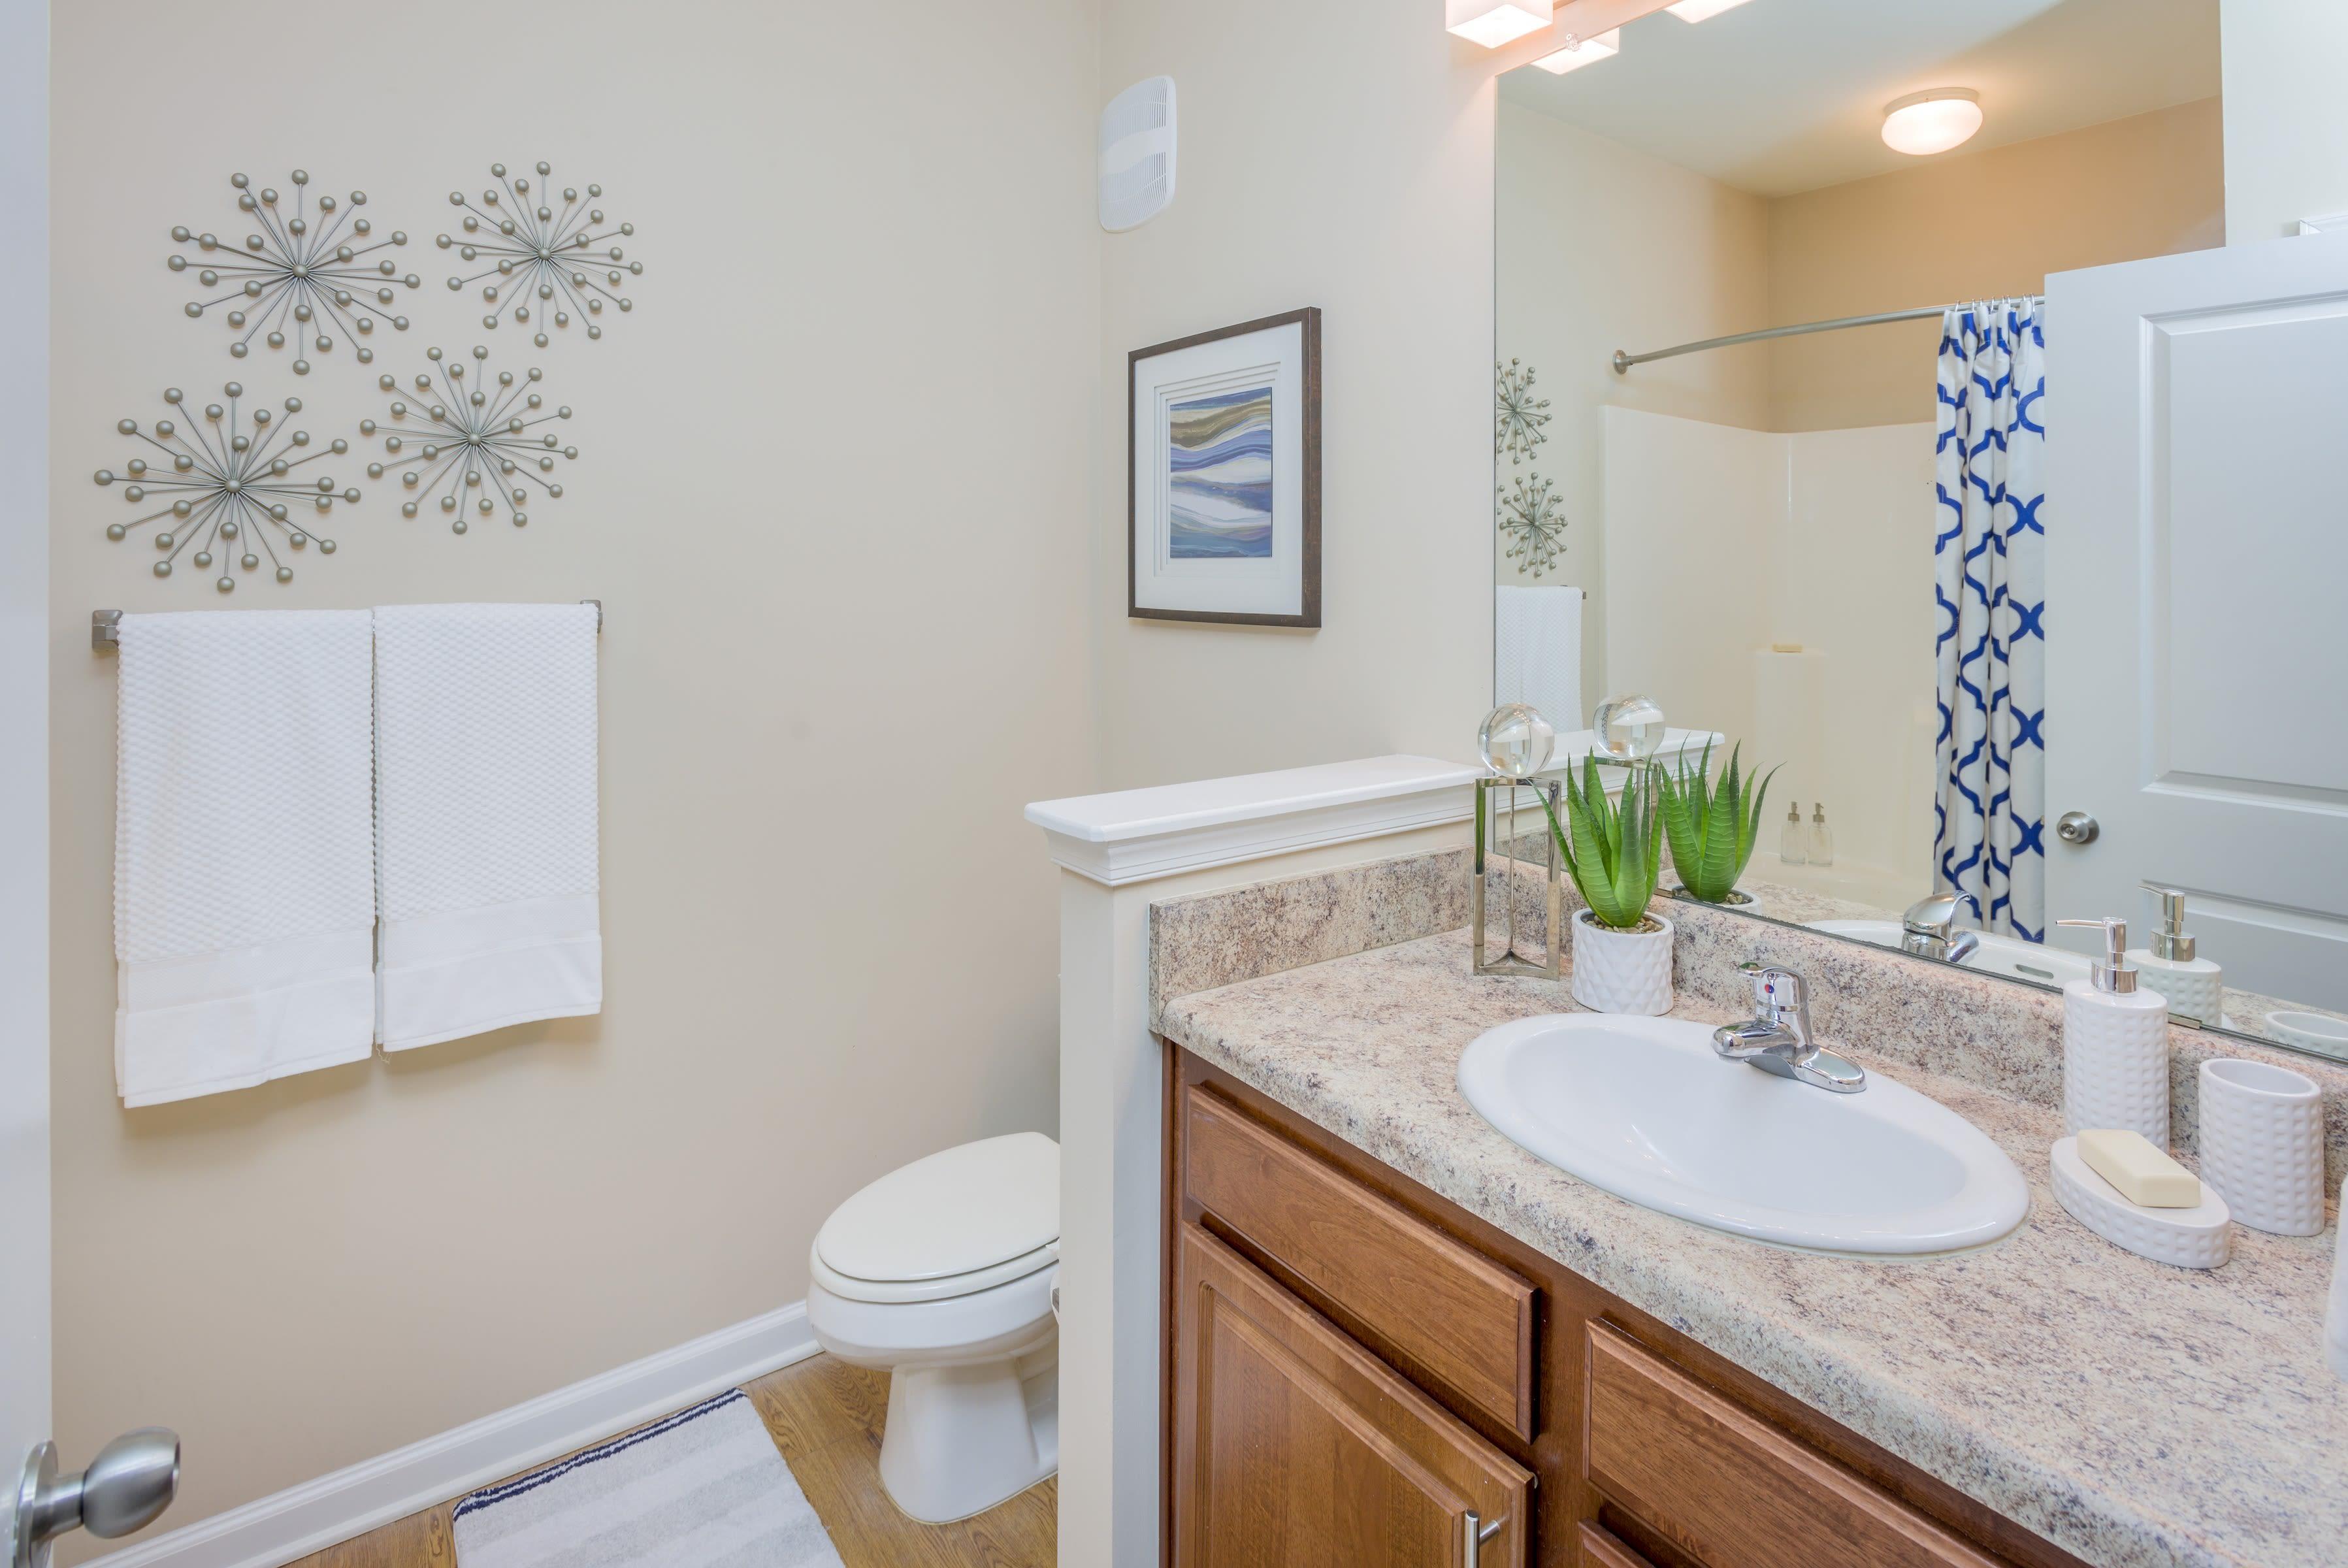 Quaint half bathroom with granite countertops at Arbor Village in Summerville, South Carolina